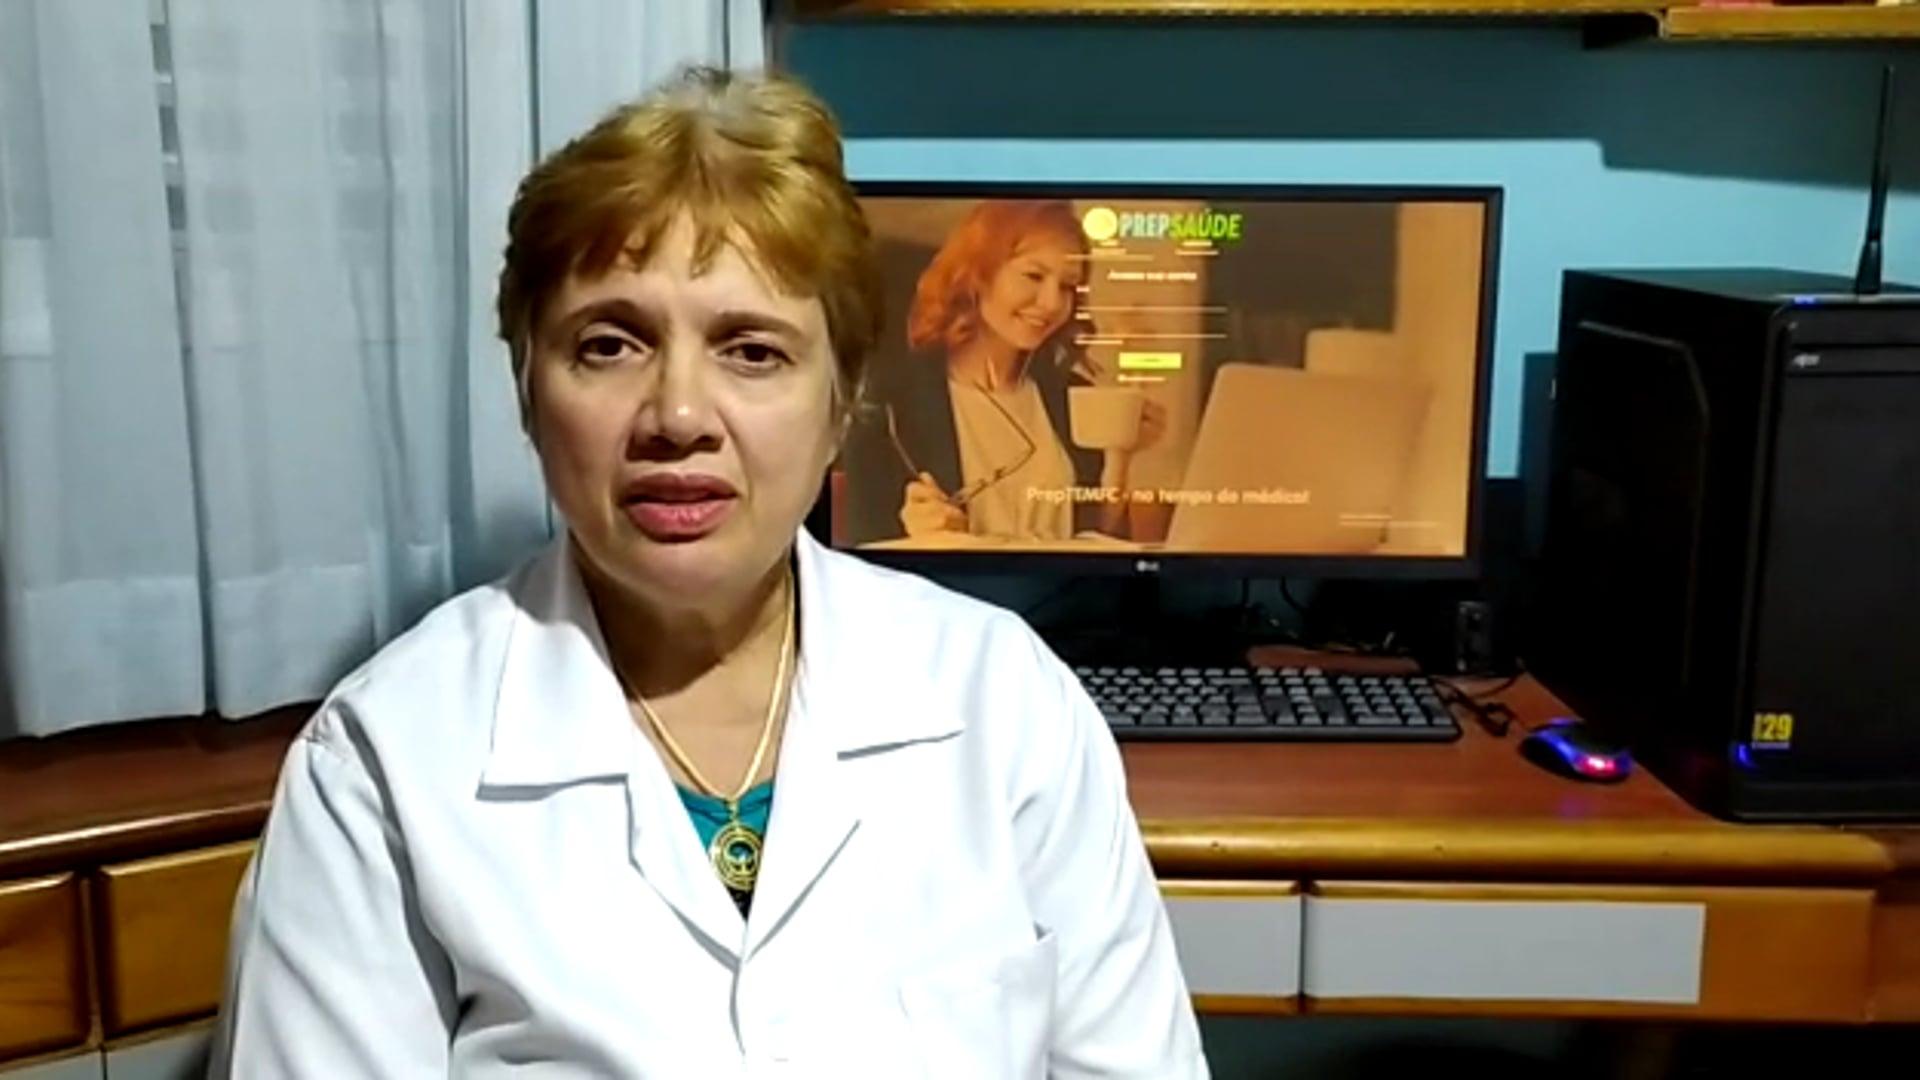 Dra. Tereza Cristina Figueiredo